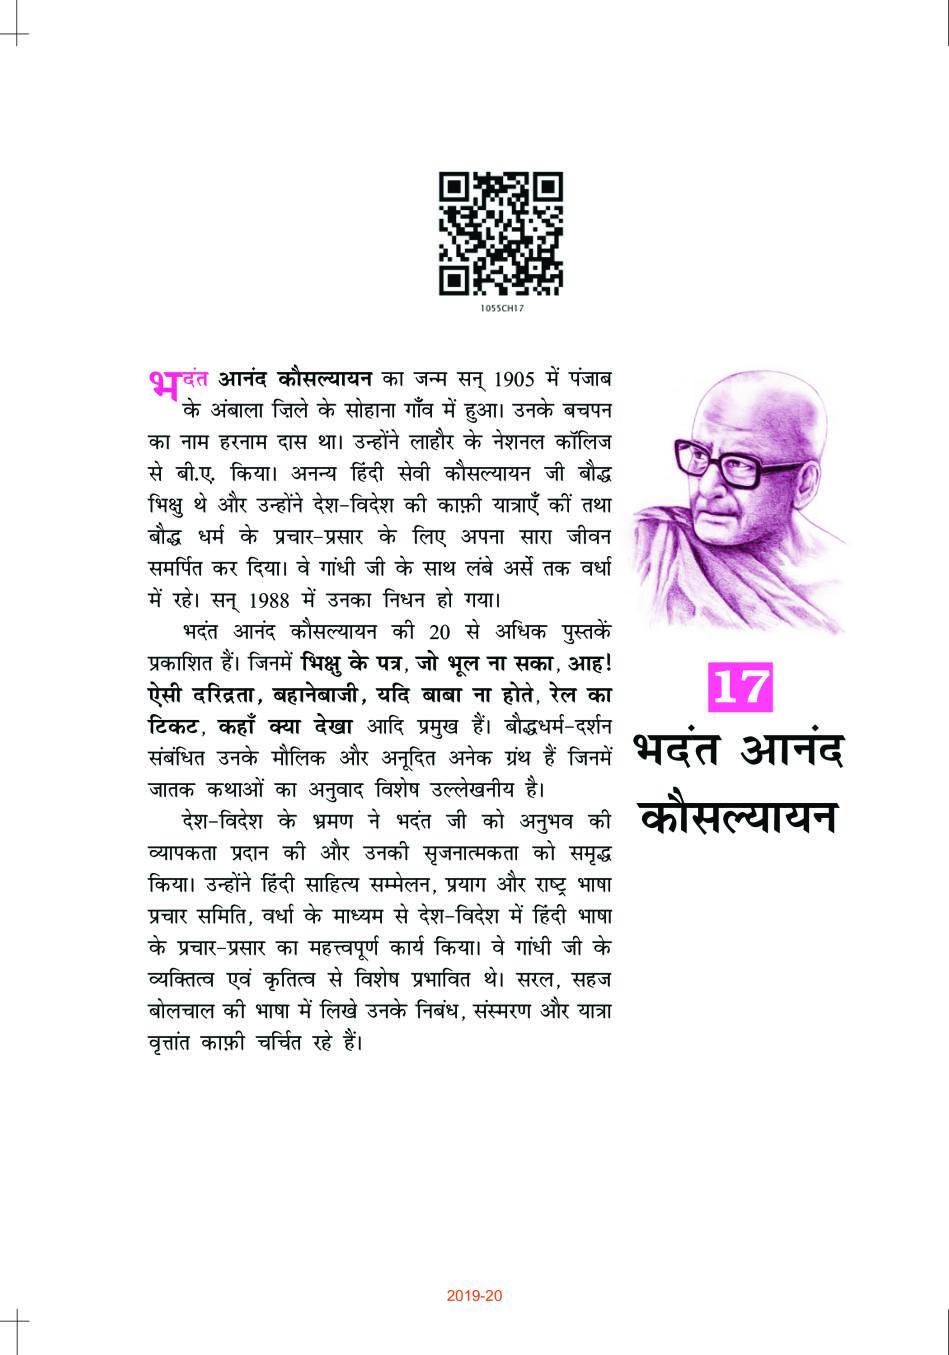 NCERT Book Class 10 Hindi (क्षितिज) Chapter 17 संस्कृति - Page 1